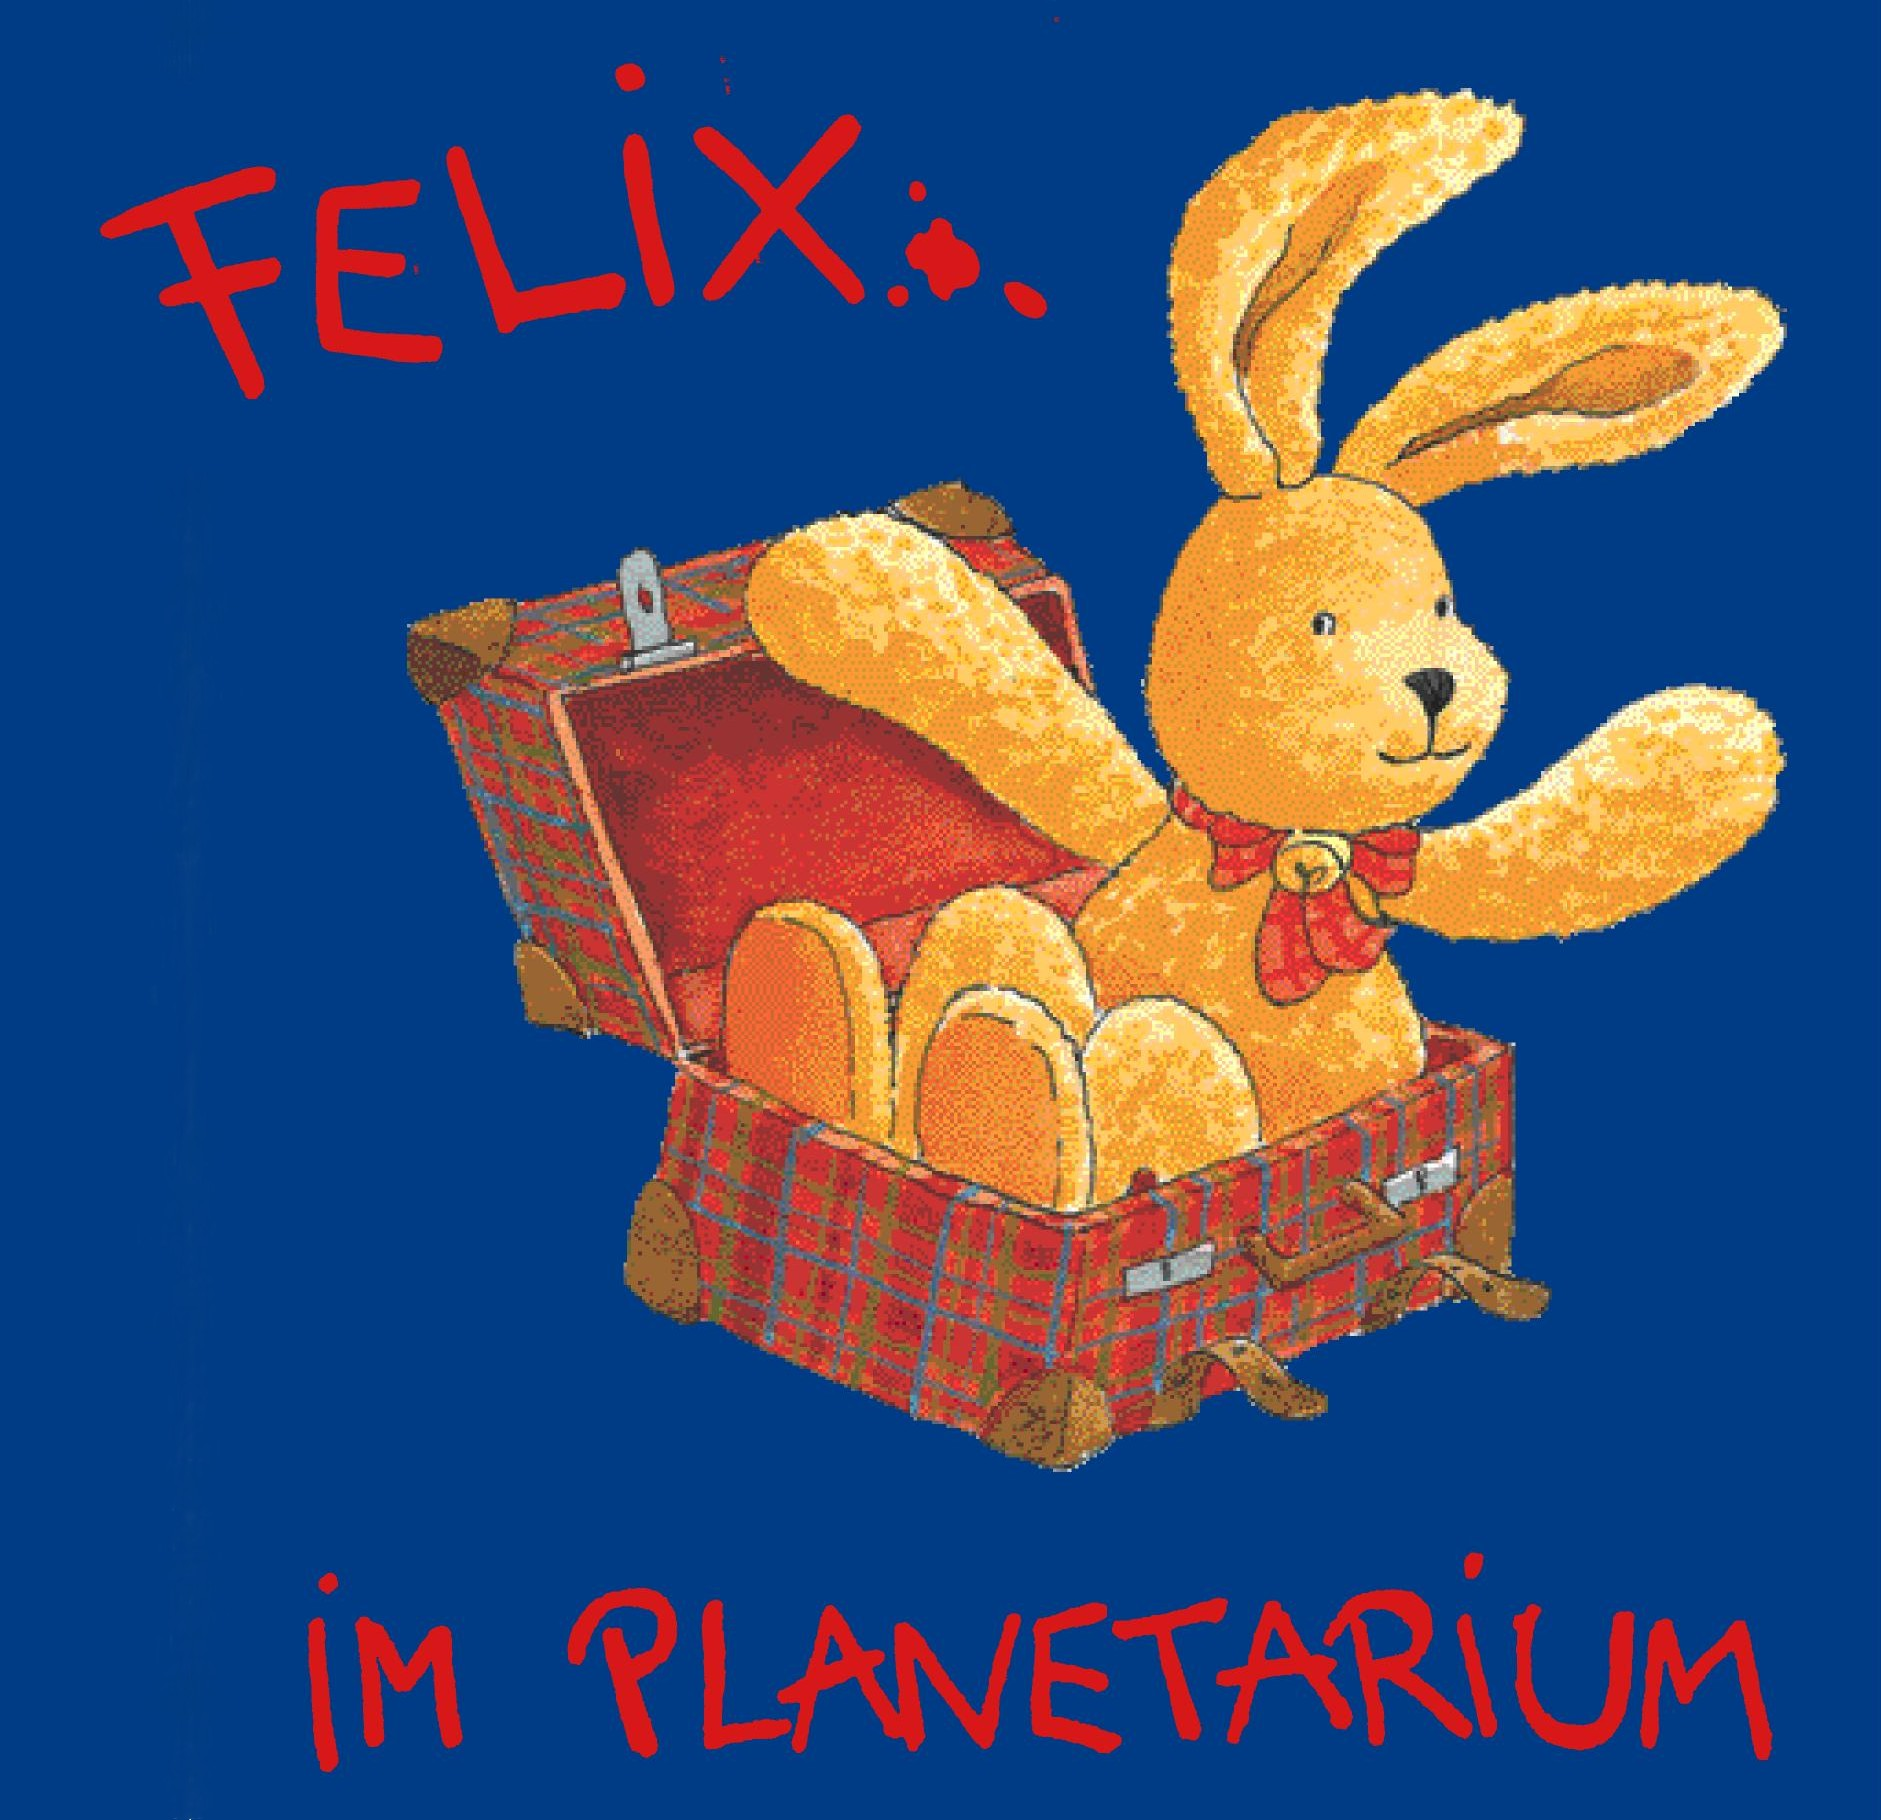 Felix_der_Hase(C)Coppenrath_Verlag.jpg